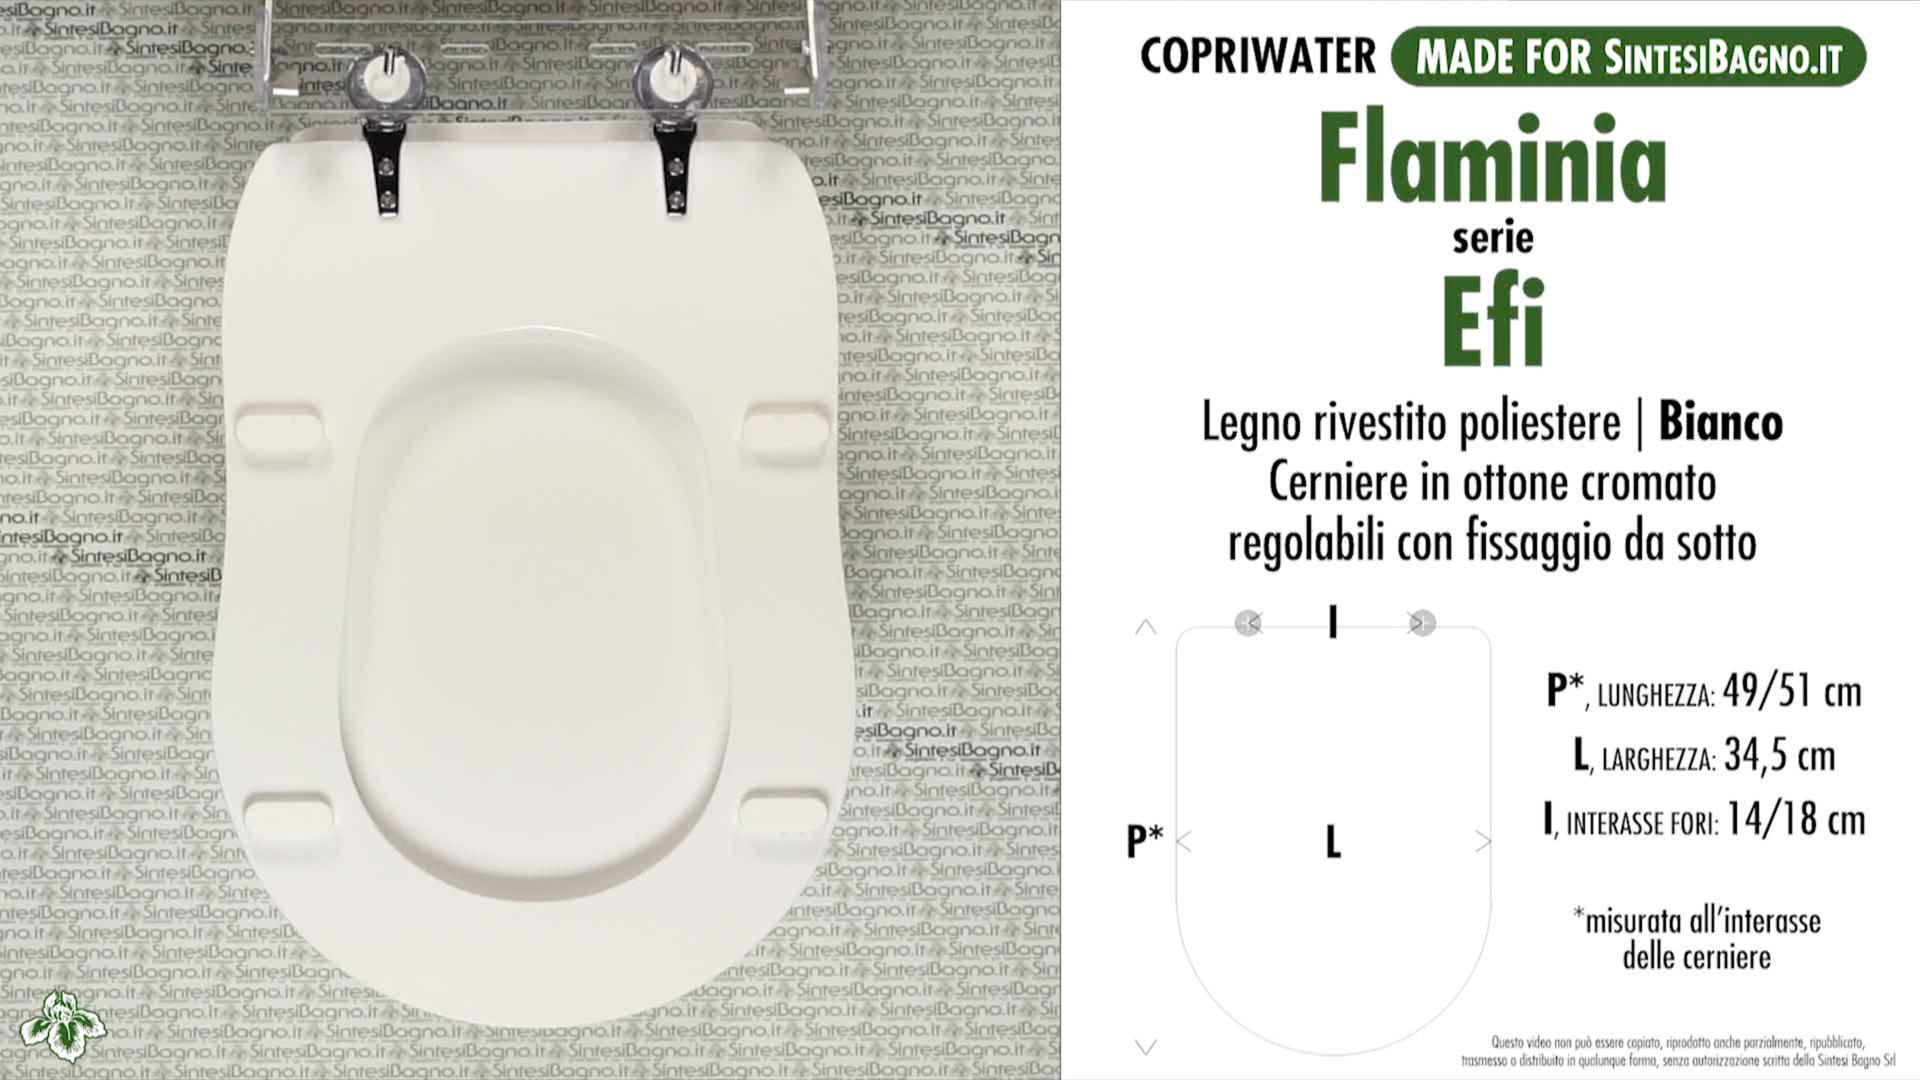 Details about Toilet Seat/WC-Seat SintesiBagno MADE for Flaminia WC EFI  series. MAM18901BI